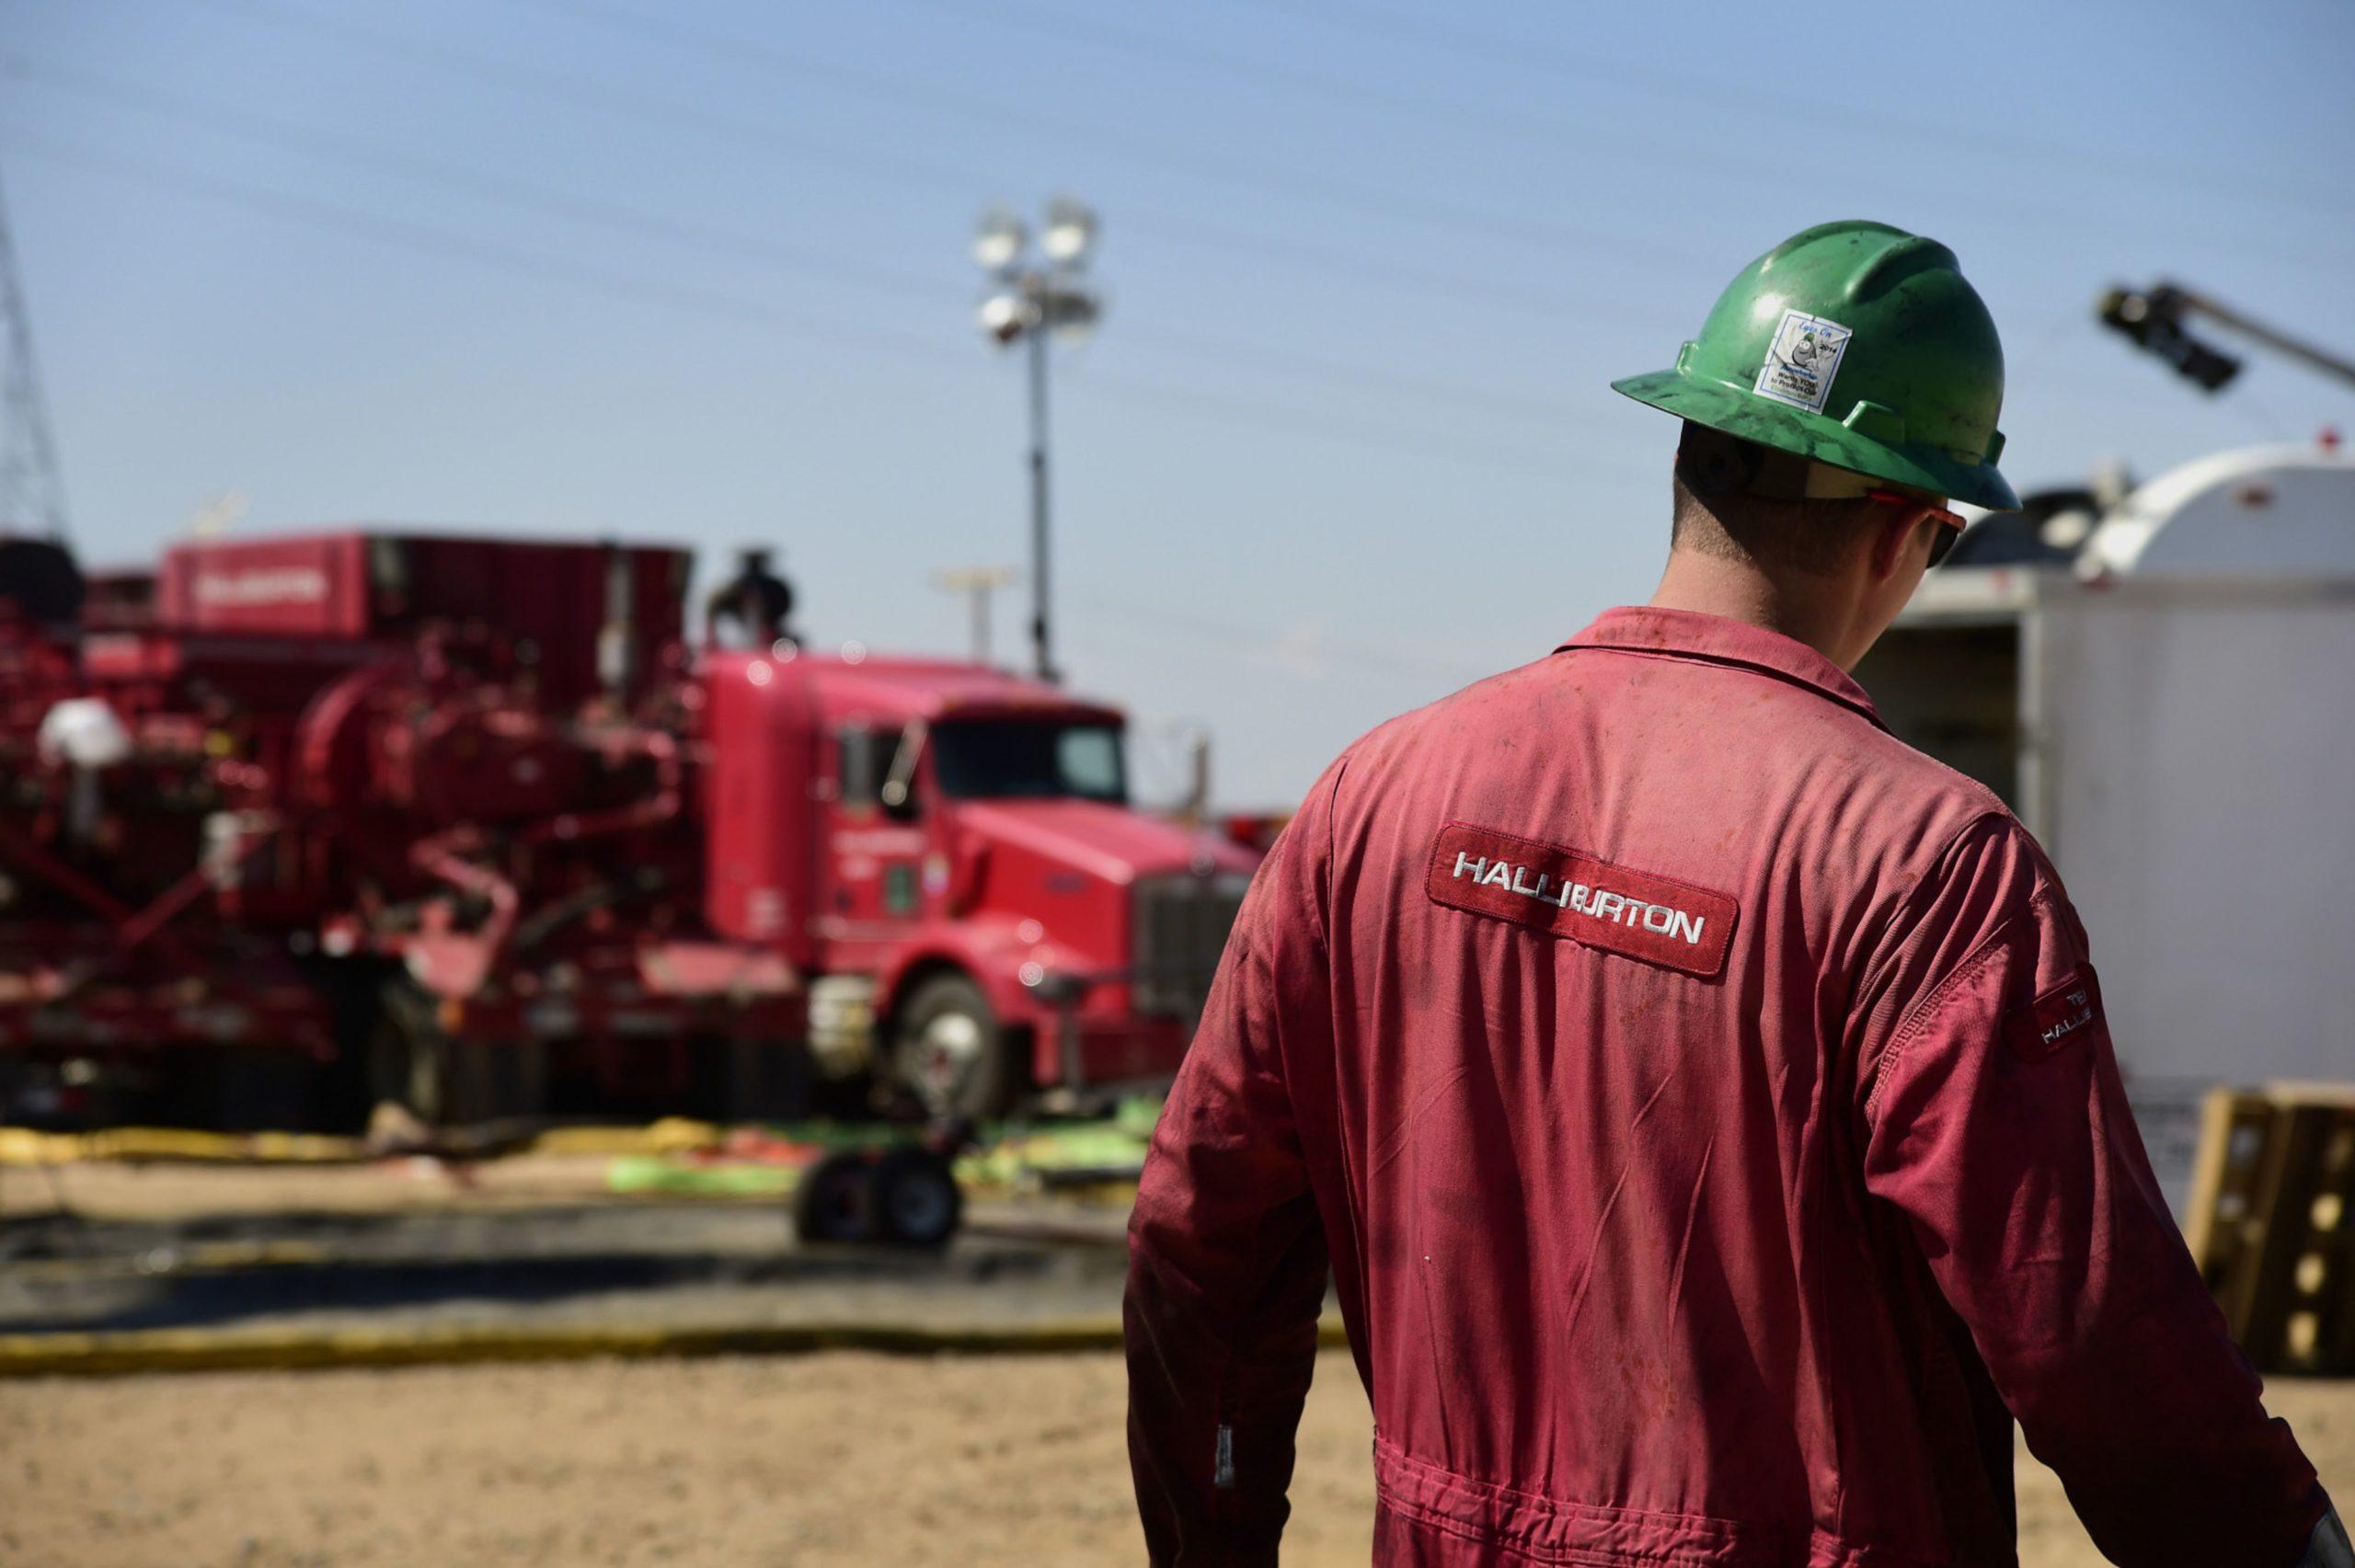 Halliburton strategy profits